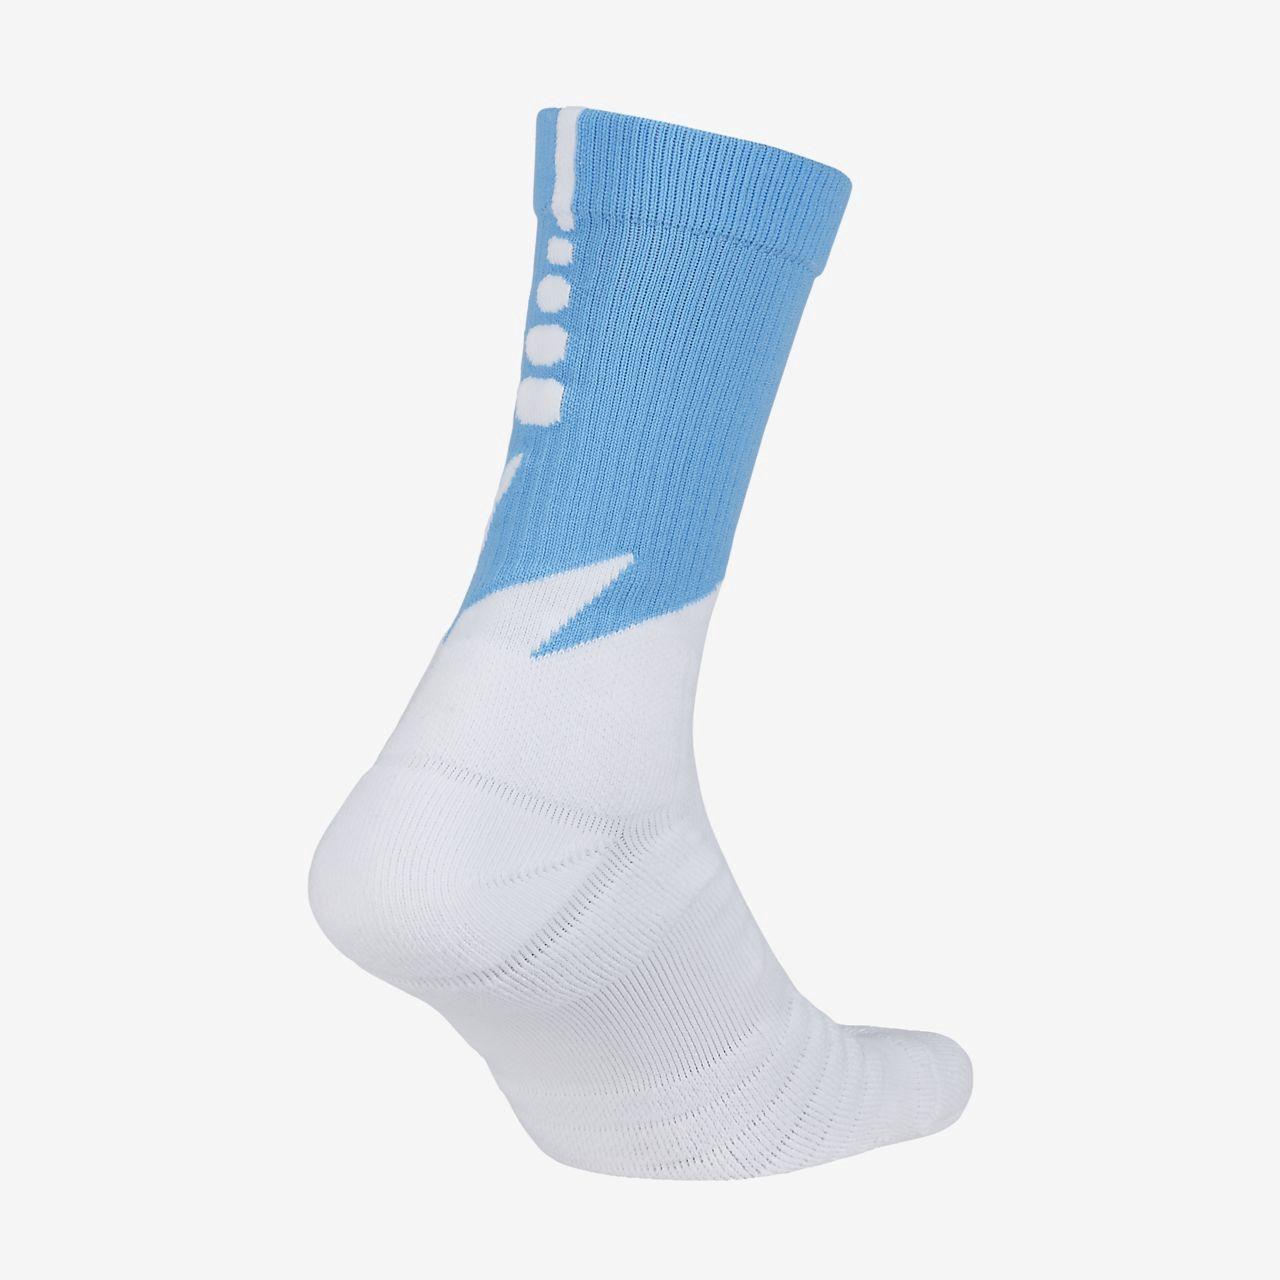 NIKE Los Angeles Clippers City Edition Nike Elite Quick NBA Crew Socks. # nike #